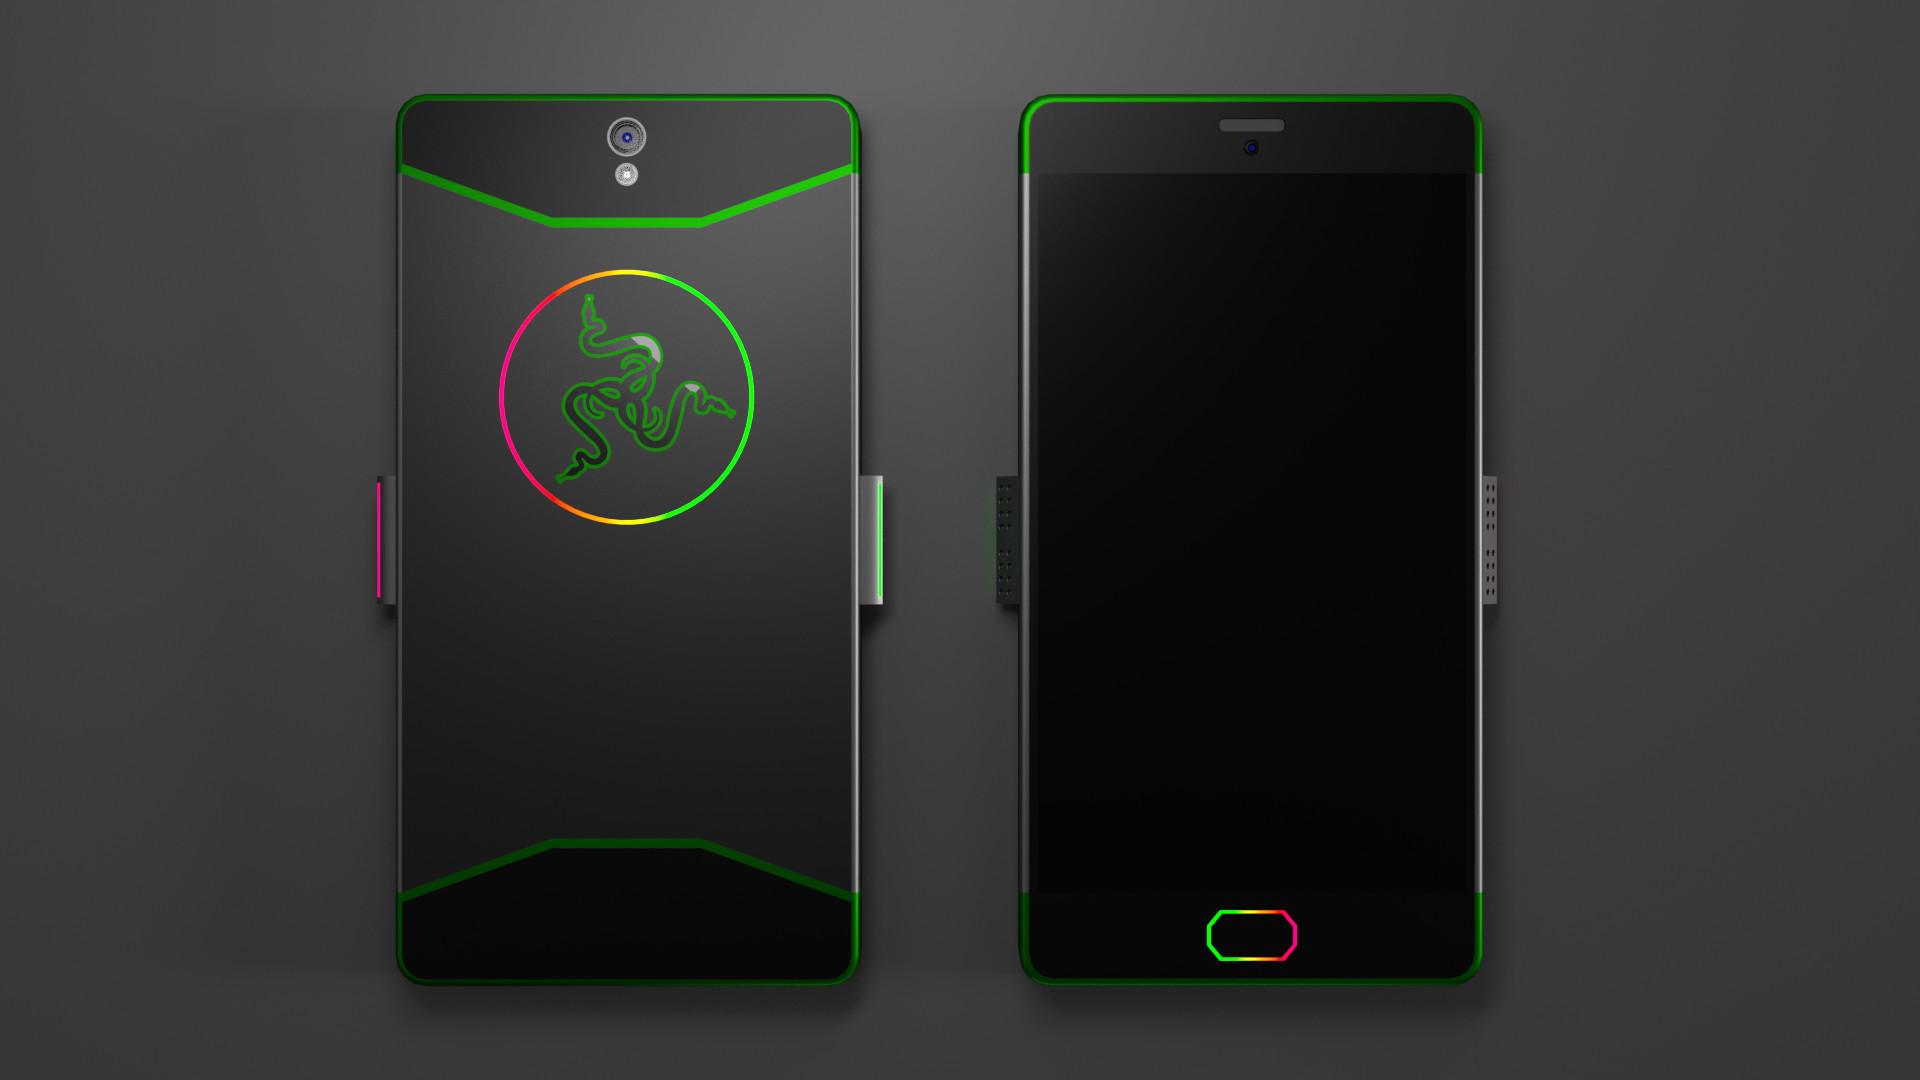 Представлен геймерский смартфон Razer Phone